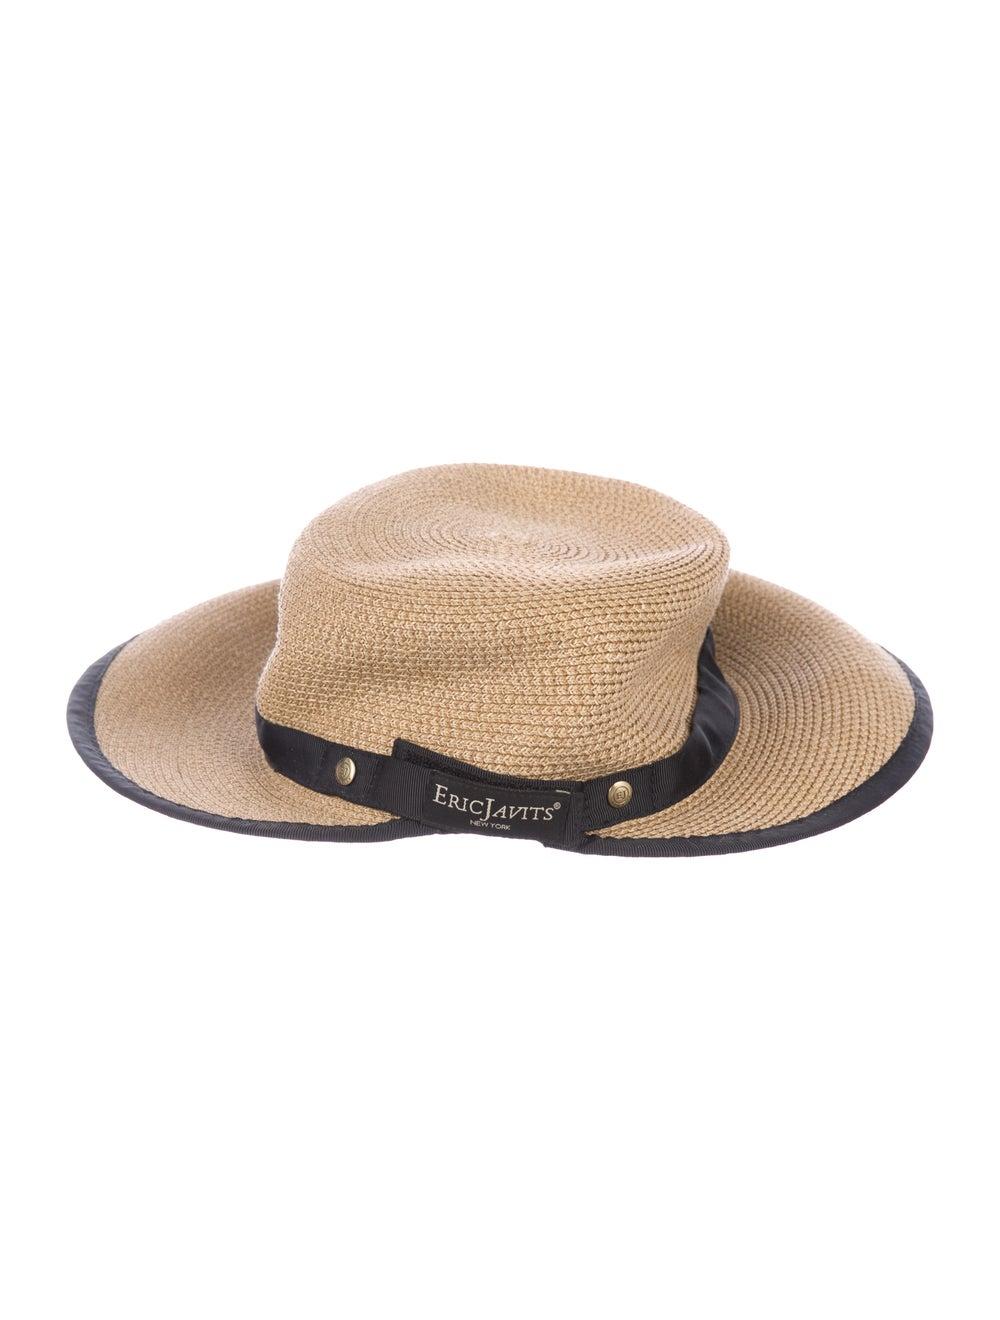 Eric Javits Straw Velcro Hat brown - image 2